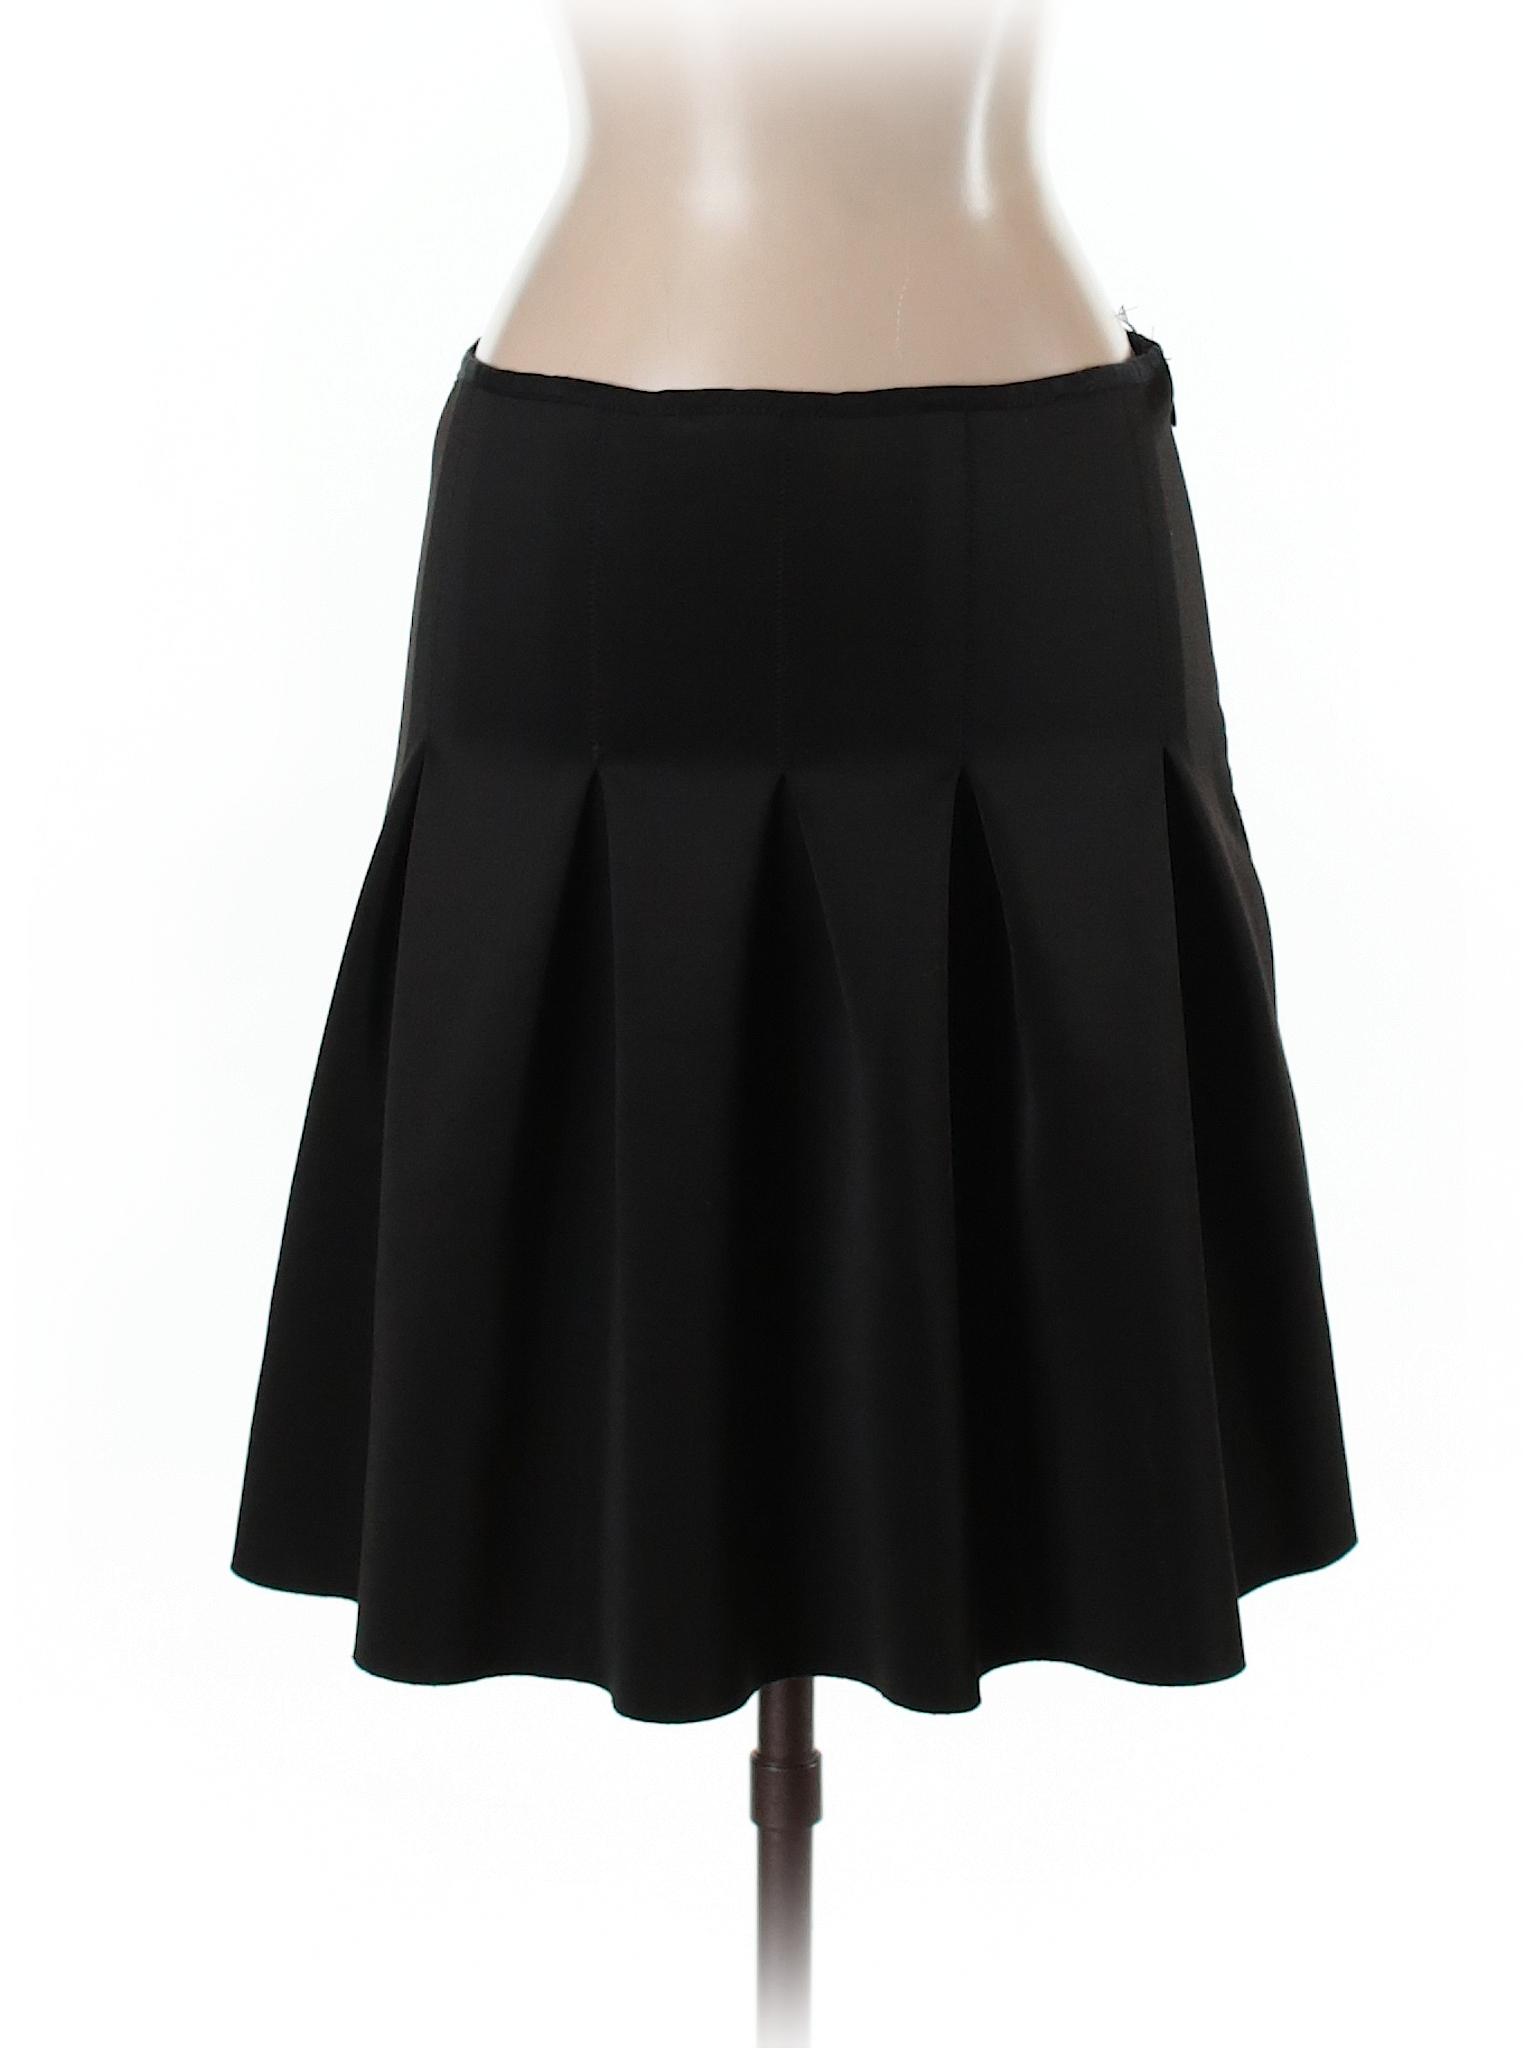 leisure leisure leisure Skirt Skirt BCBGeneration Boutique Casual Boutique BCBGeneration Boutique BCBGeneration BCBGeneration leisure Boutique Casual Casual Skirt nxPOBgt